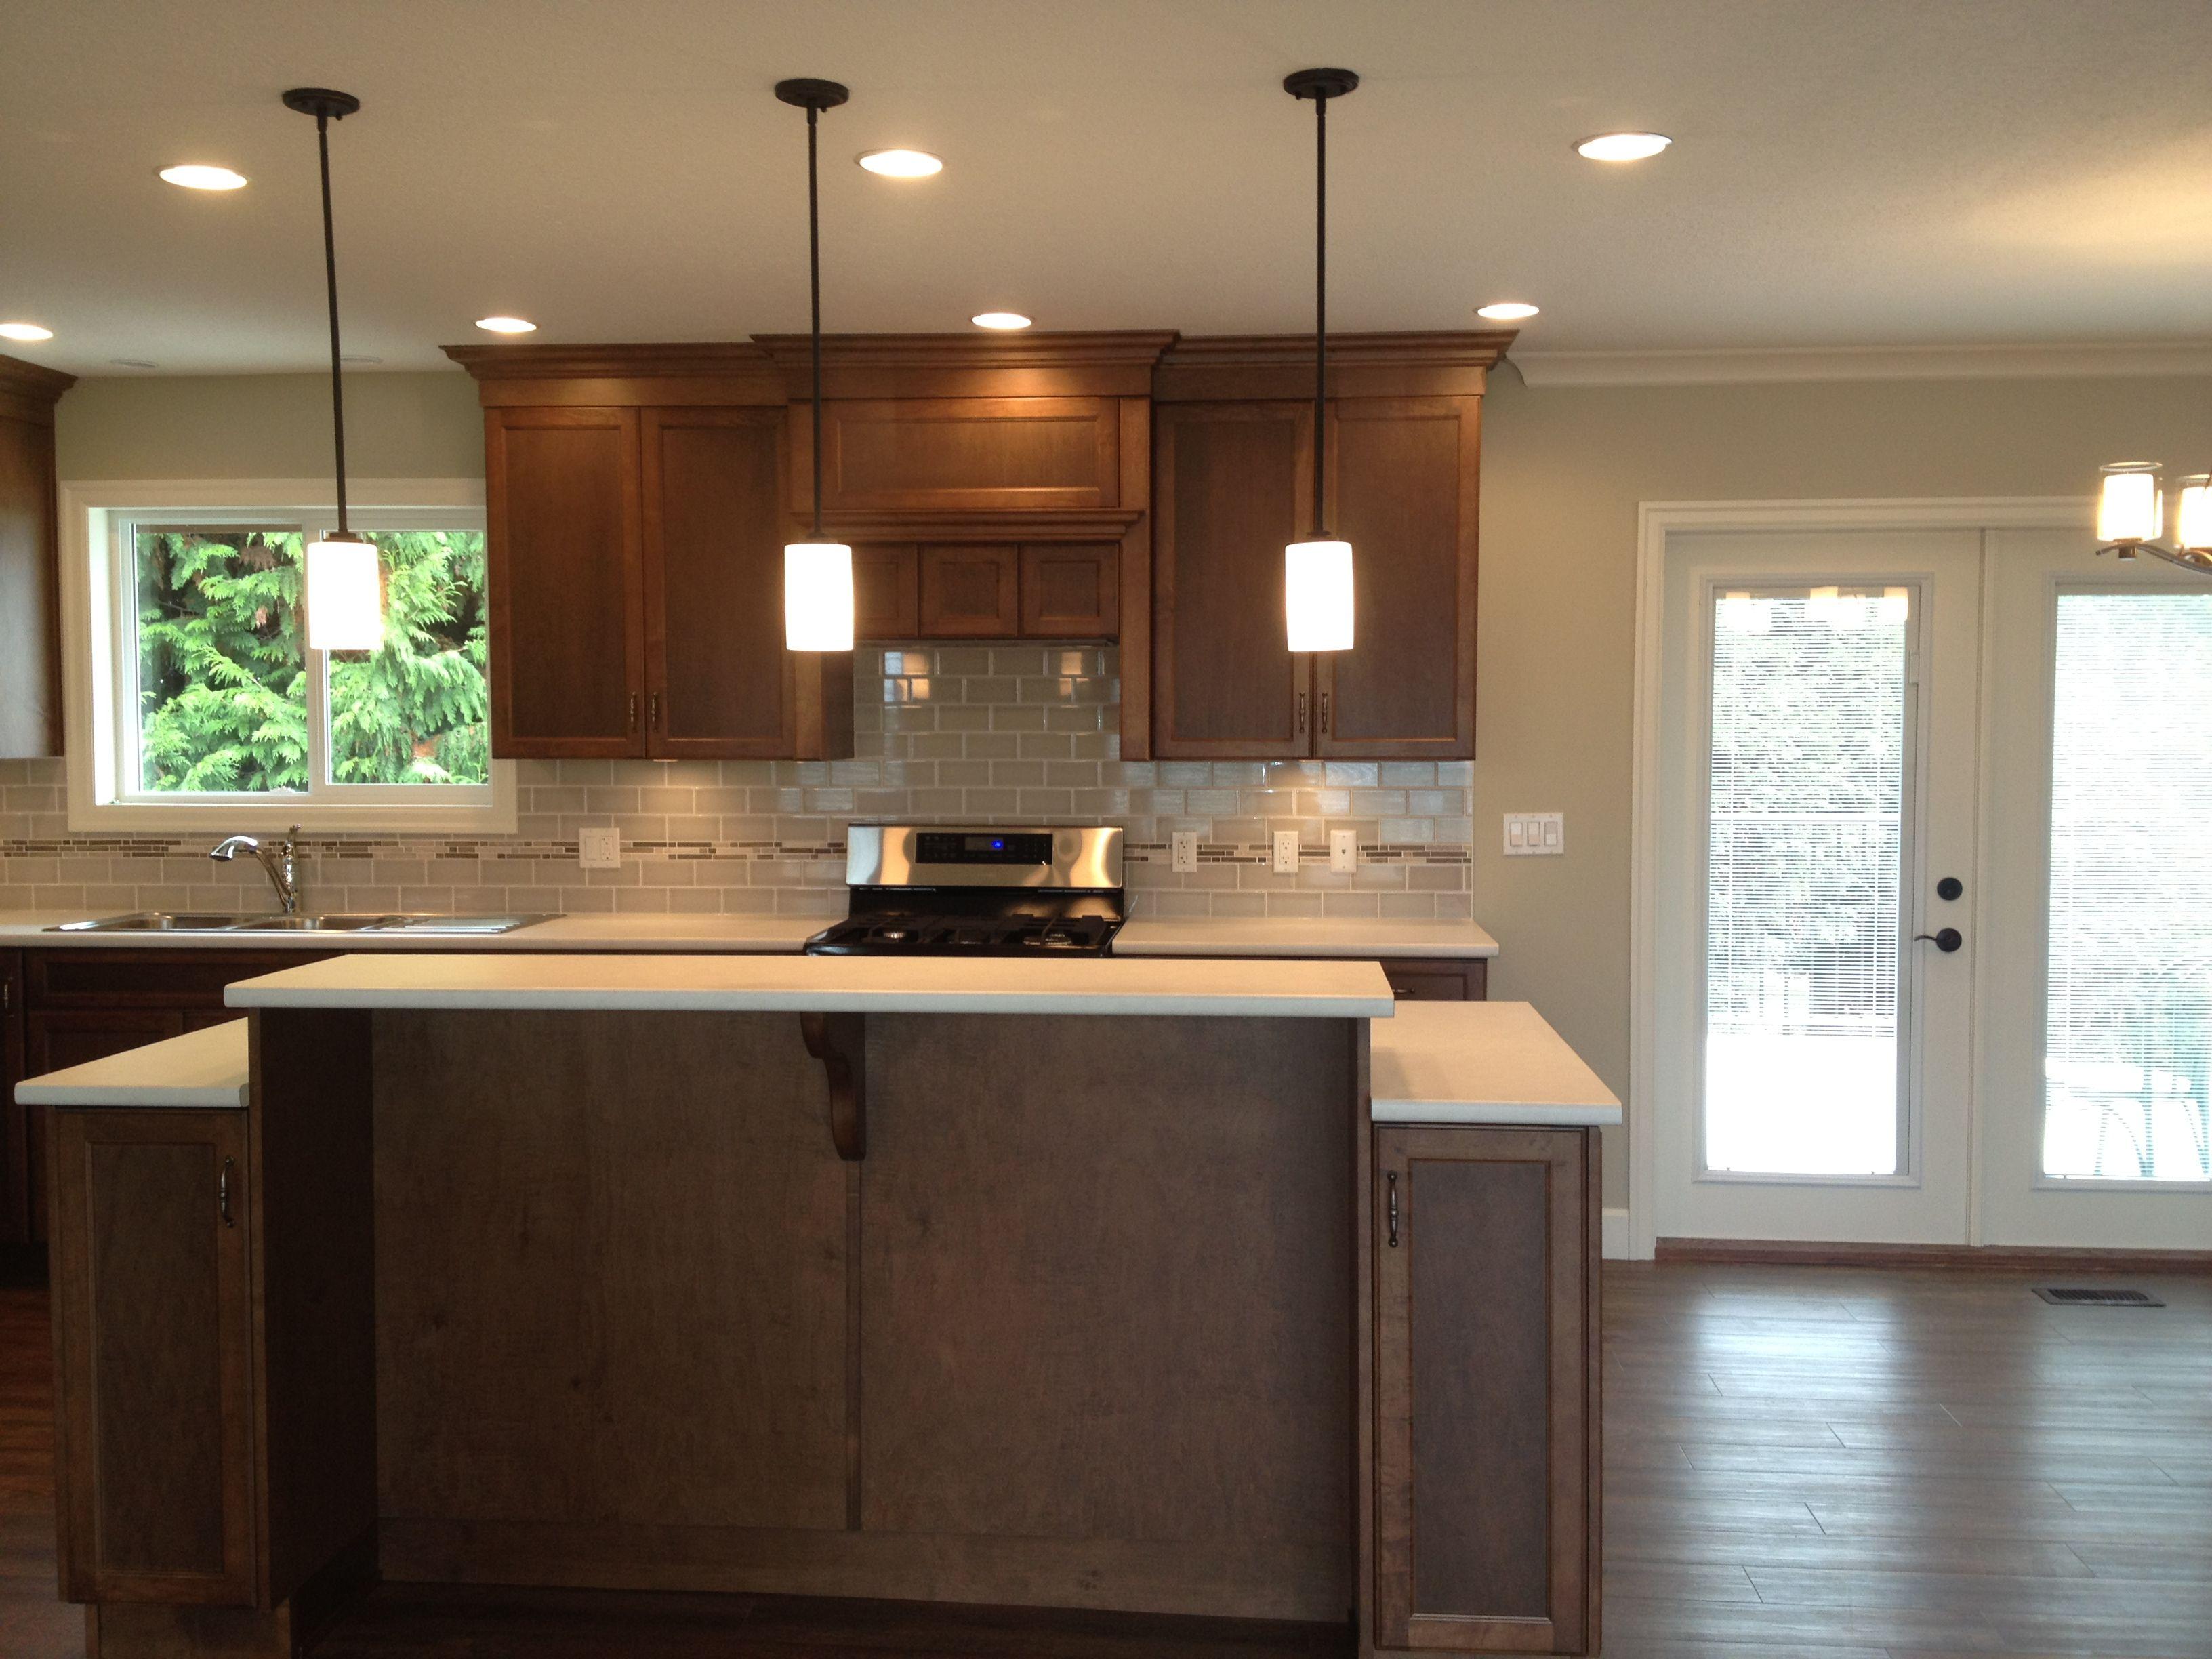 BC Box Reno, kitchen renovation, bathroom renovation ...